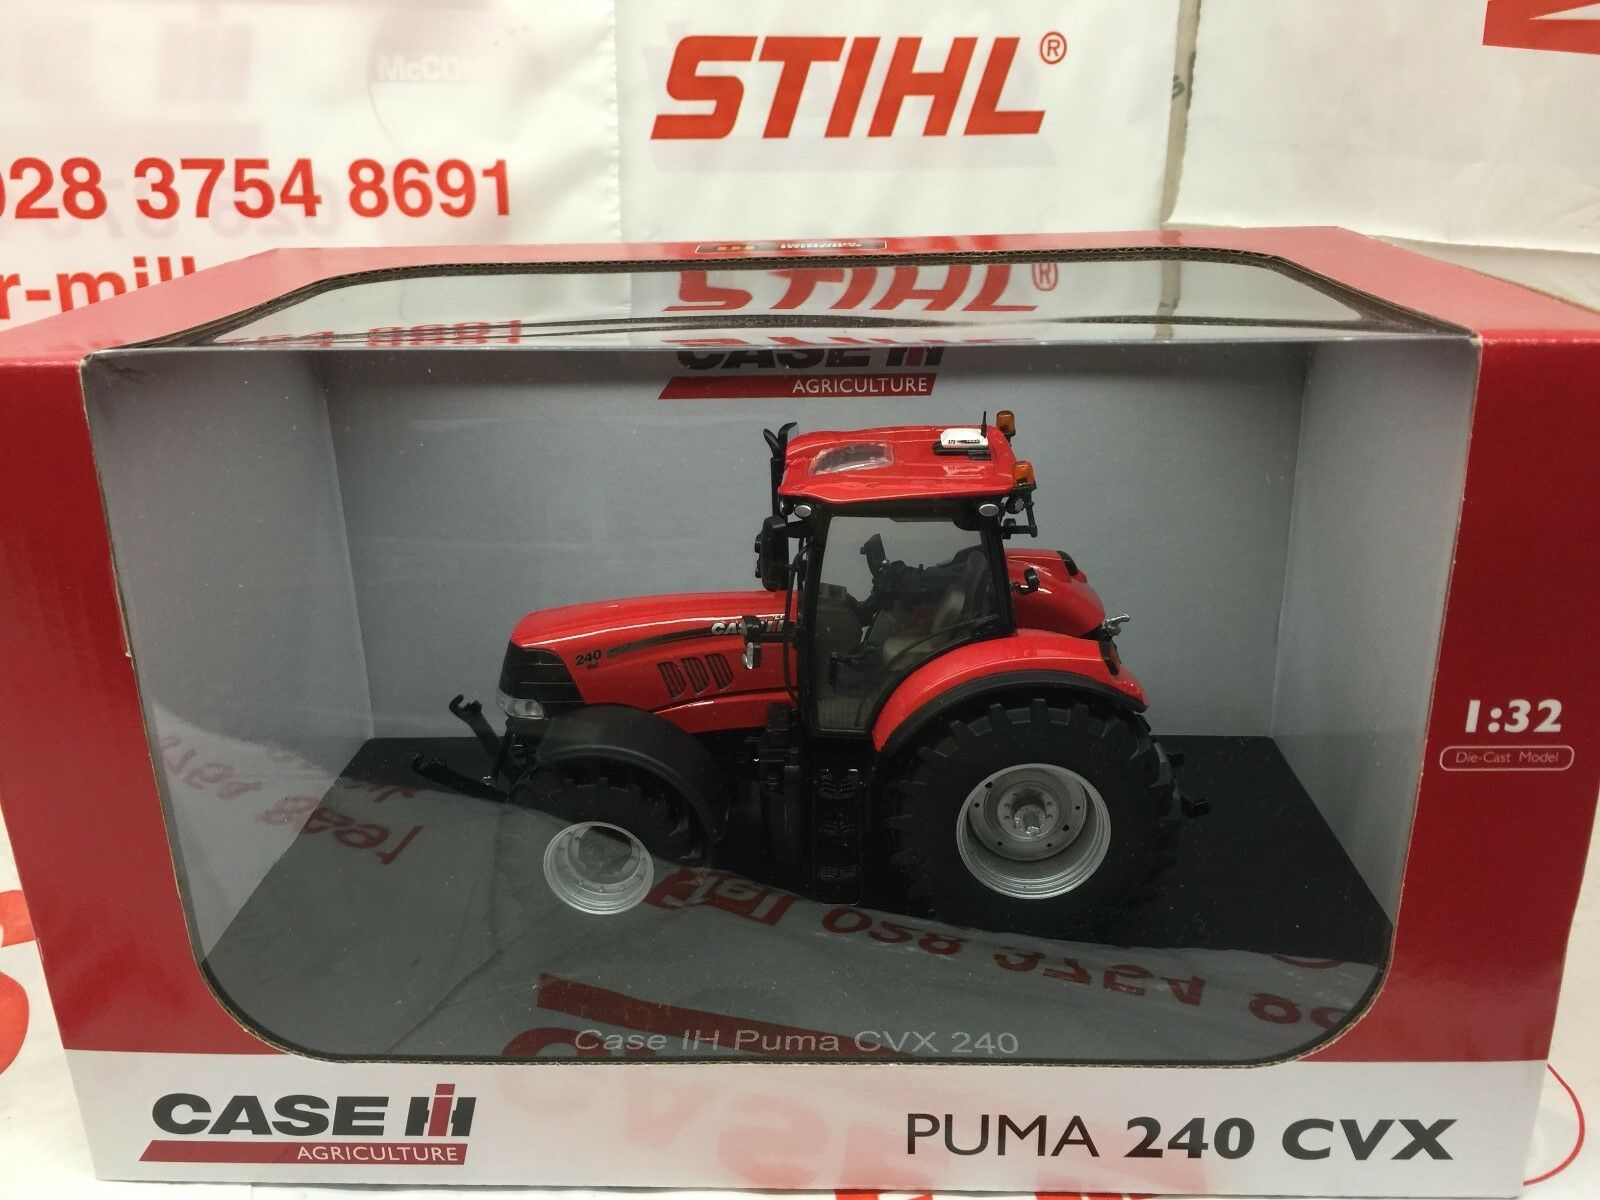 Universal Hobbies UH4911 CASE IH Puma 240 CVX Tracteur 1 32 Replica Diecast Toy